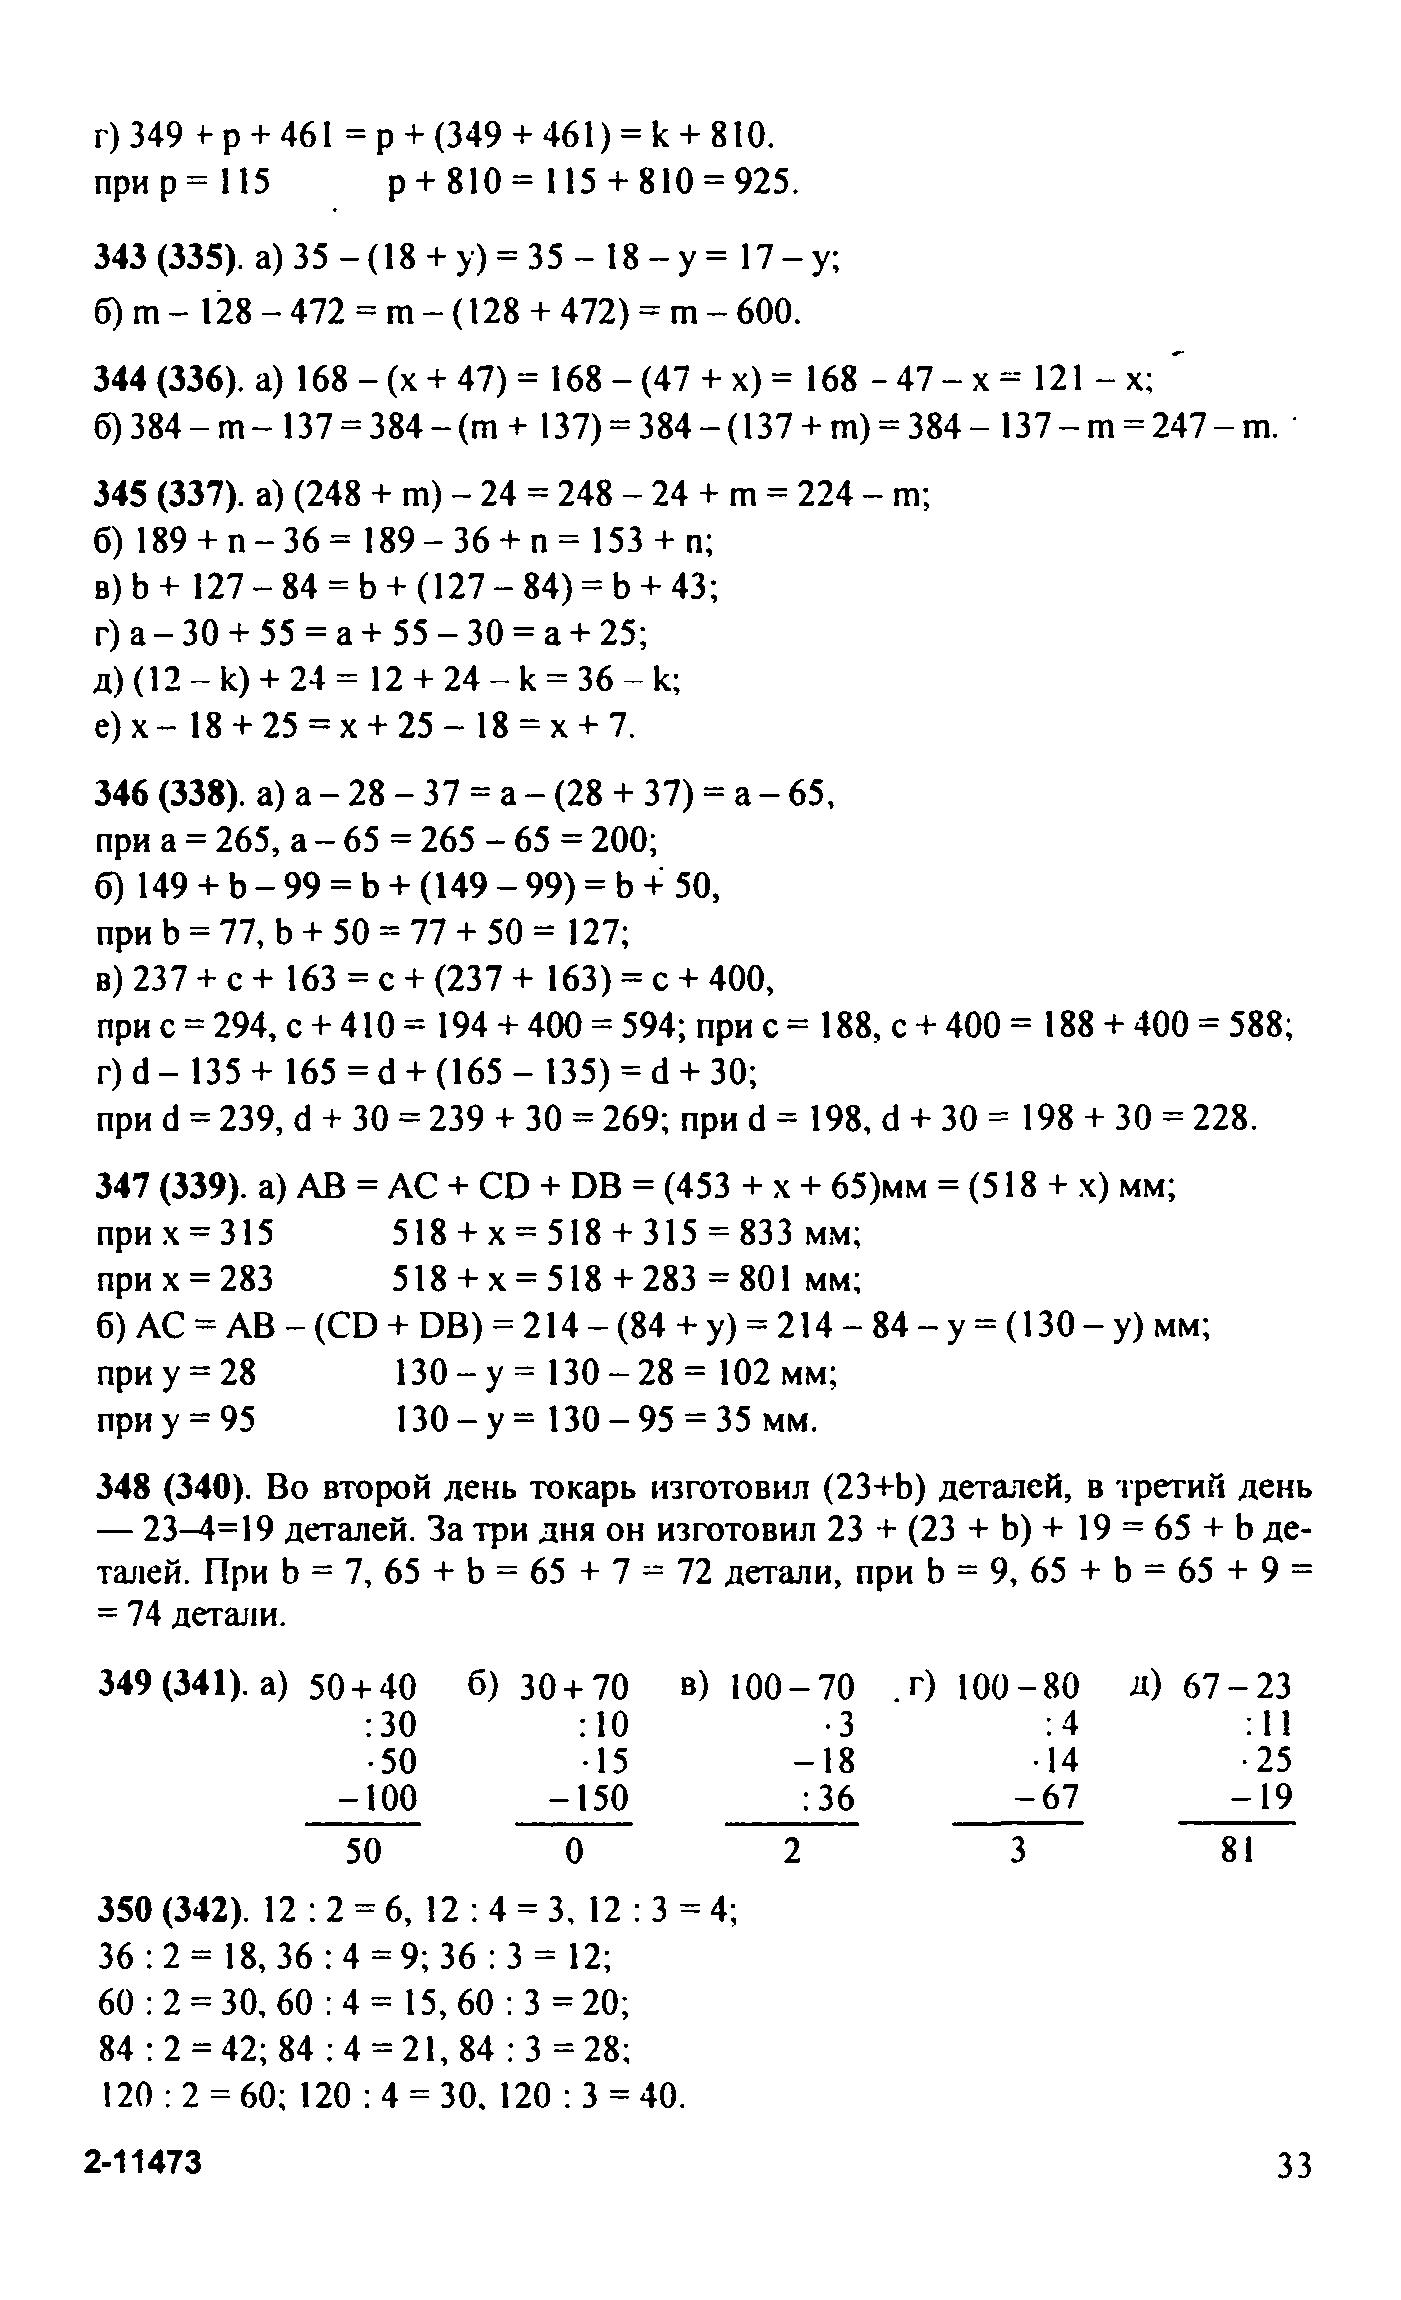 Гдз по математике 5 класс номер 339